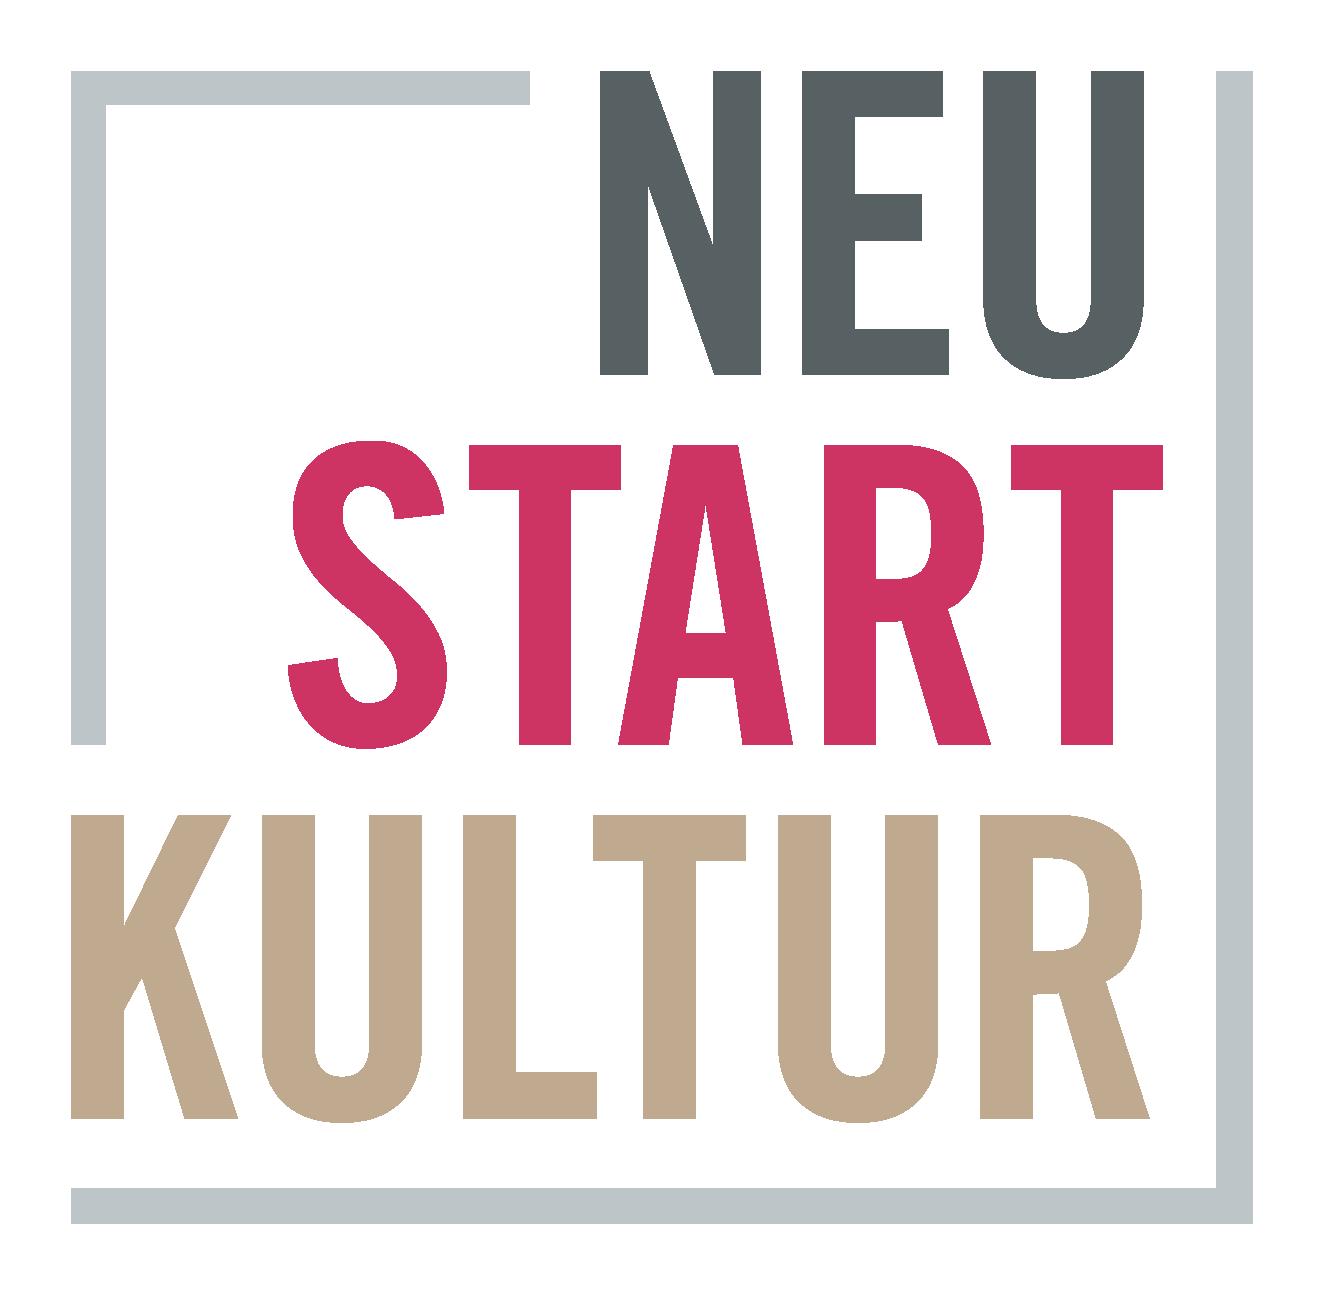 https://neustartkultur-klassik.musikrat.org/fileadmin/user_upload/Download/Logo/BKM_Neustart_Kultur_Wortmarke_neg_RGB_RZ-1.png